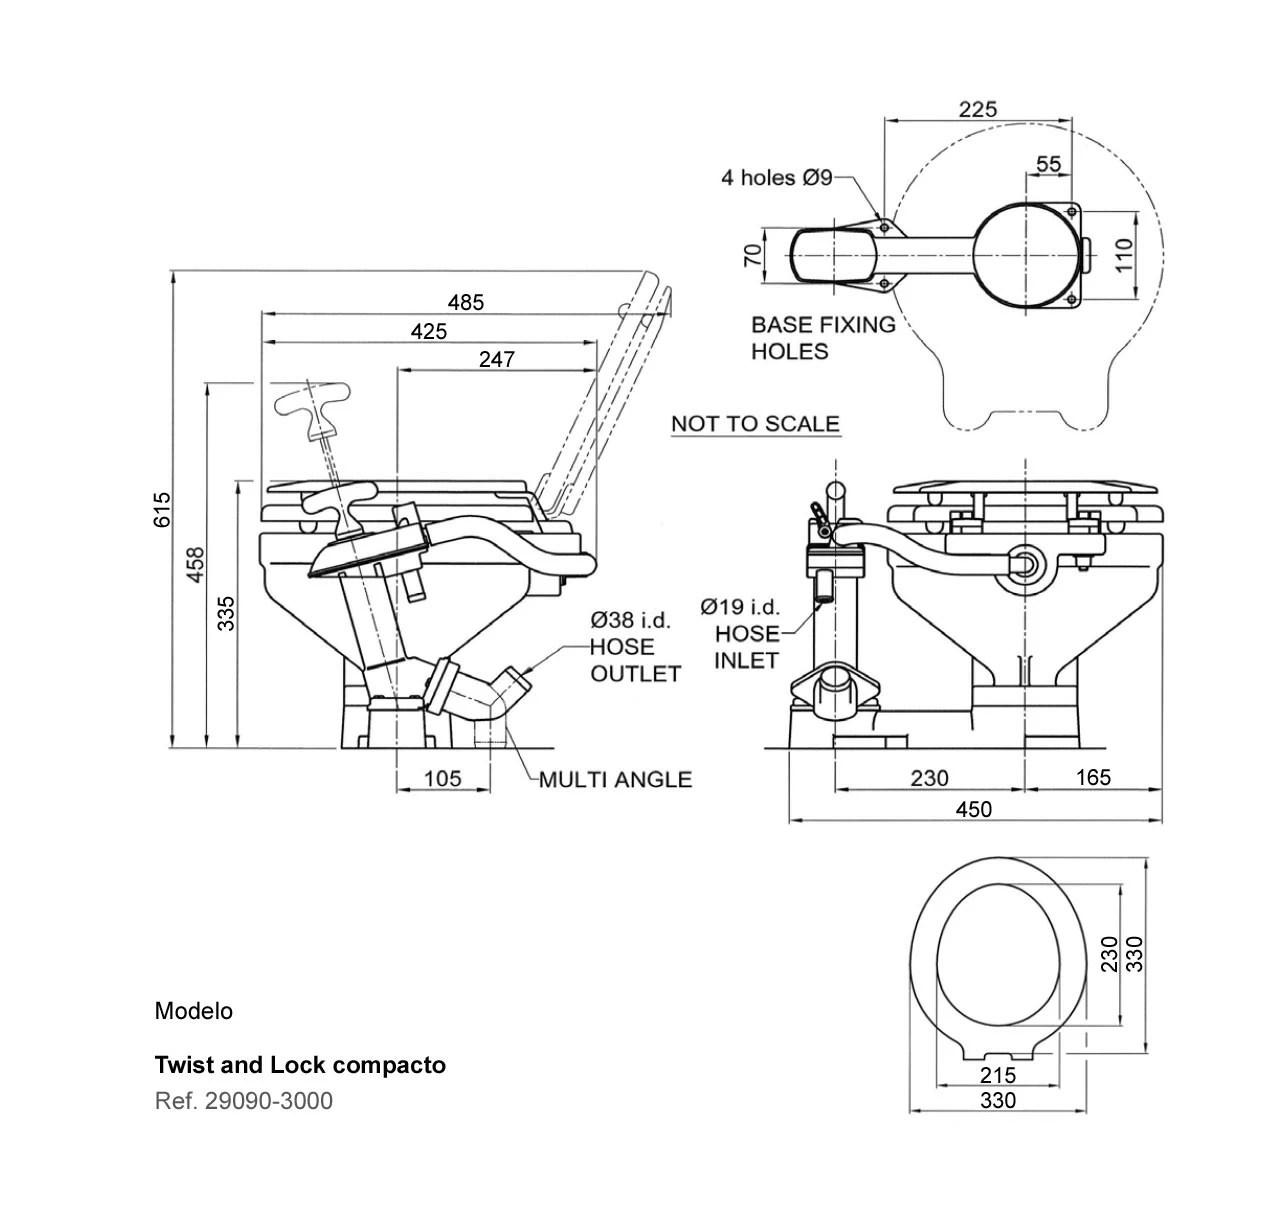 Jabsco Toilet Wc Manual Compact Twist And Lock Gt Plumbing